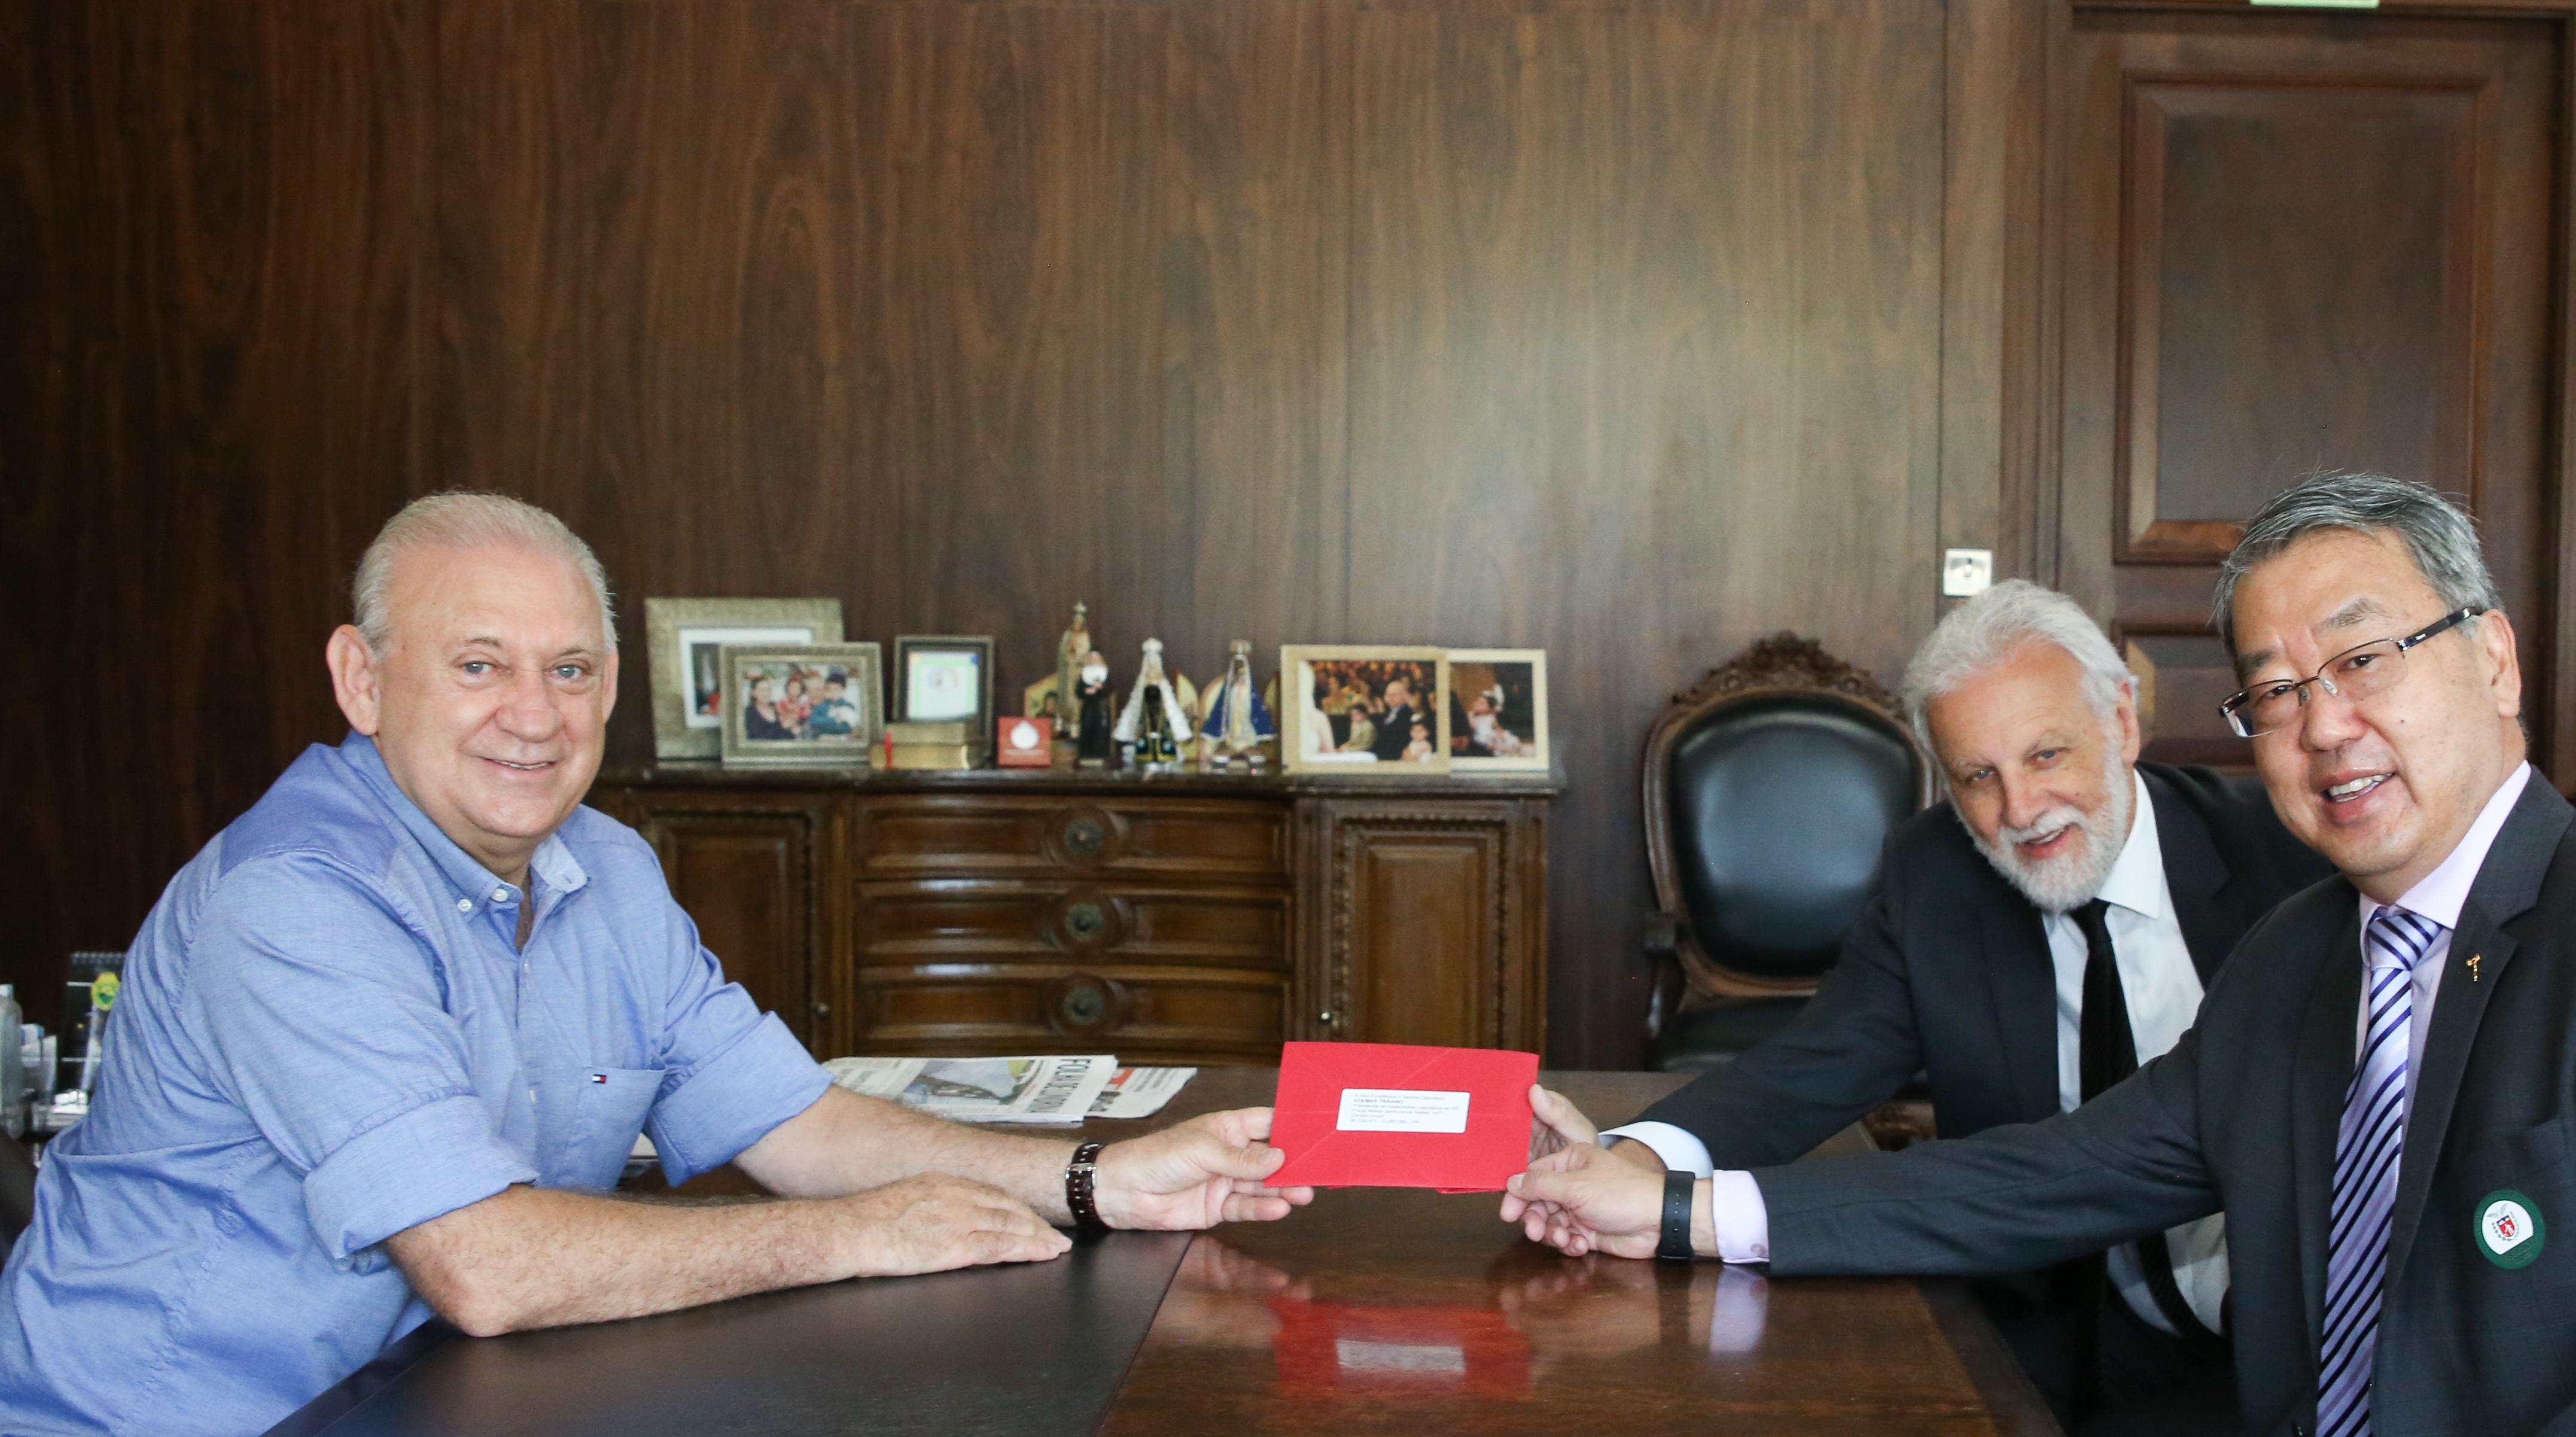 Traiano recebe o novo presidente eleito do TRE